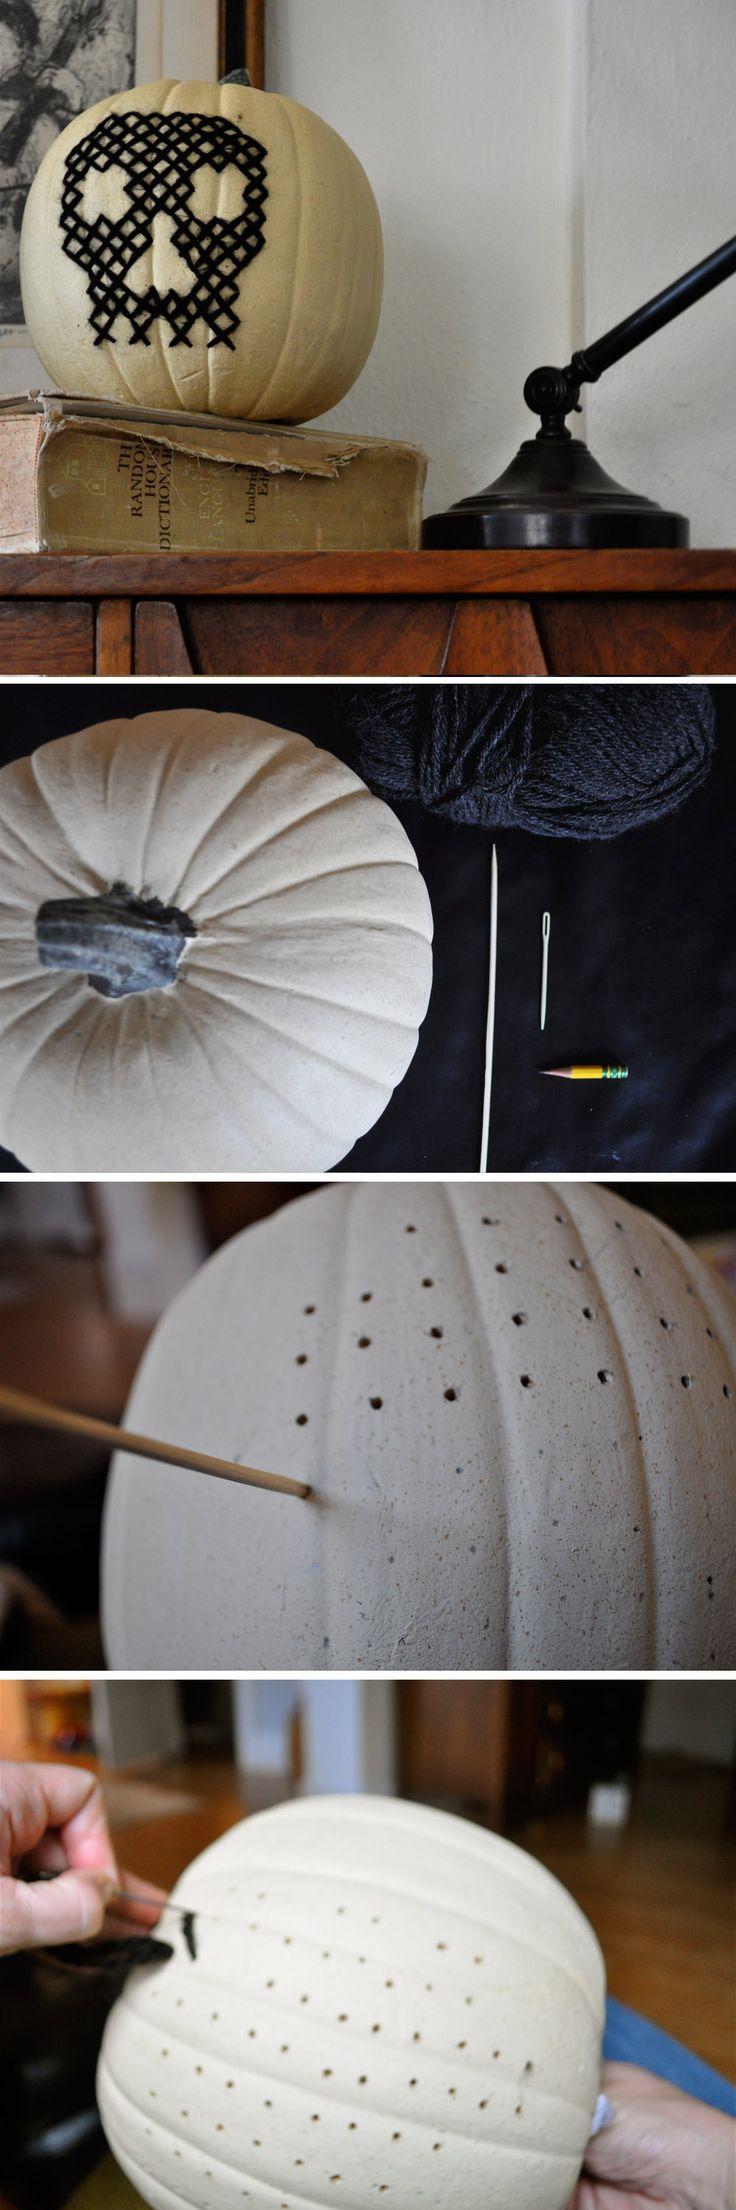 DIY: Cross stitch skull on plastic pumpkin - halloween decoration